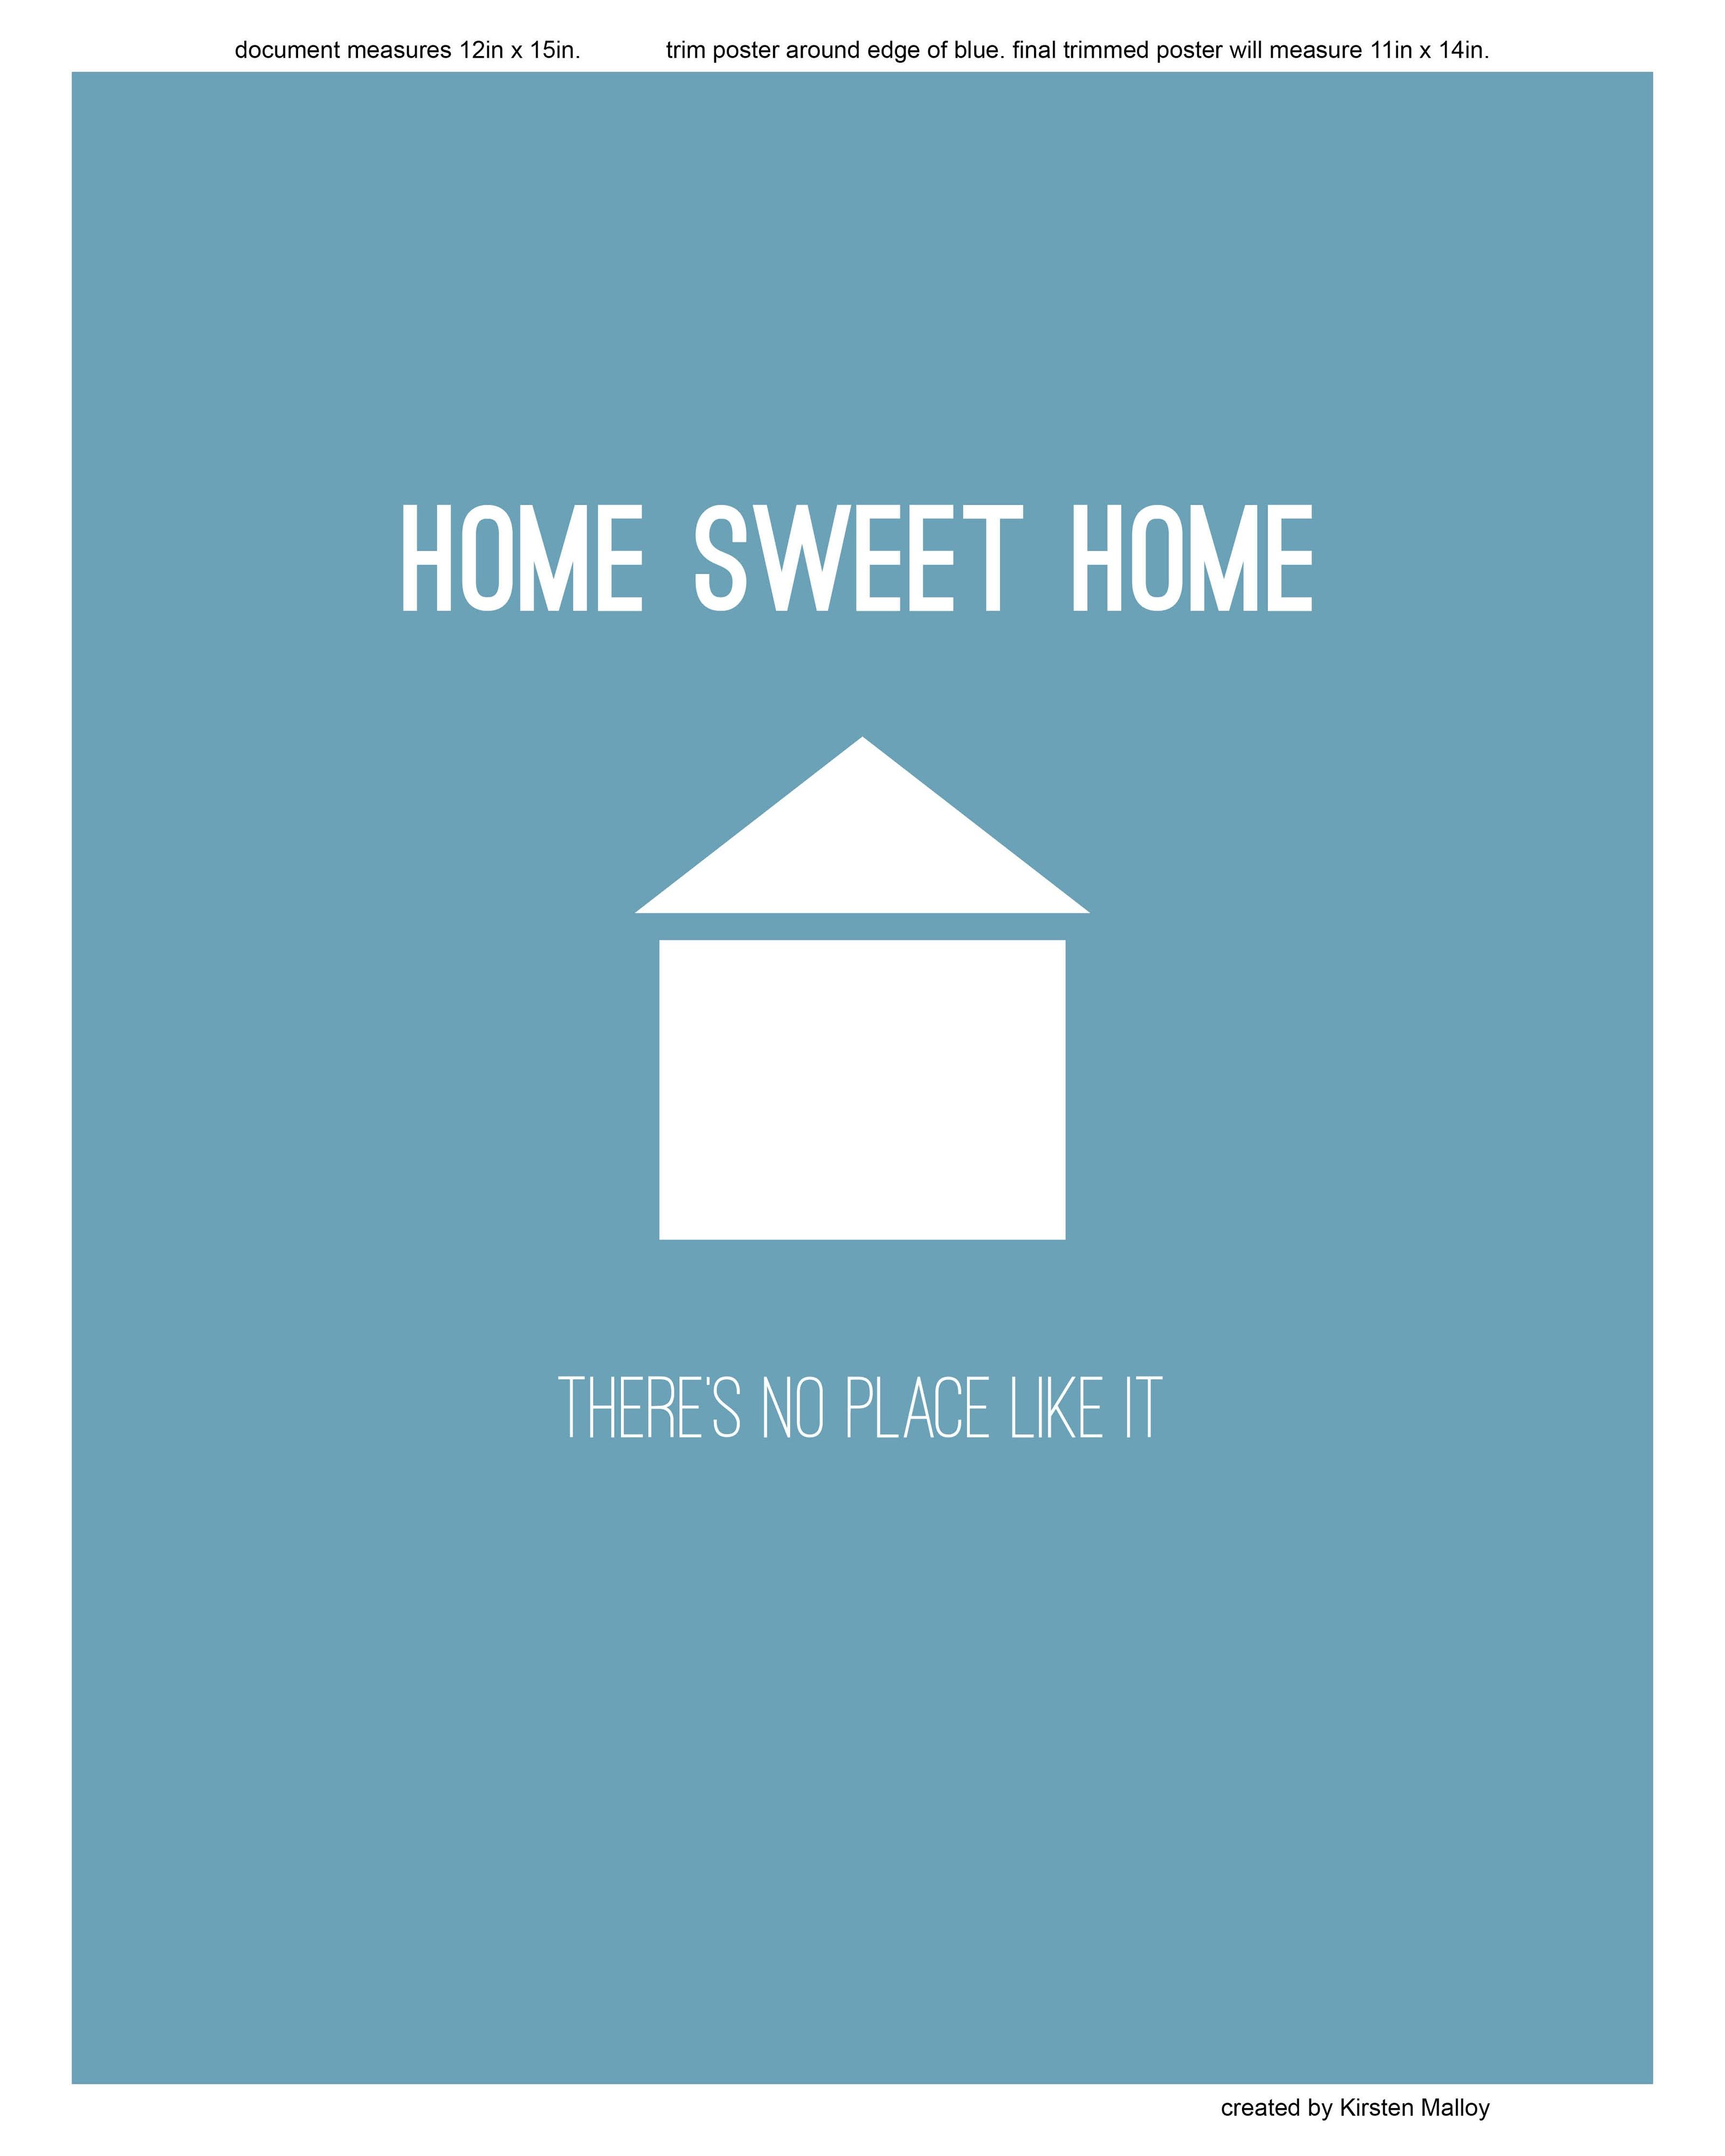 image regarding Home Sweet Home Printable identified as House Lovable Household Printable - Blue